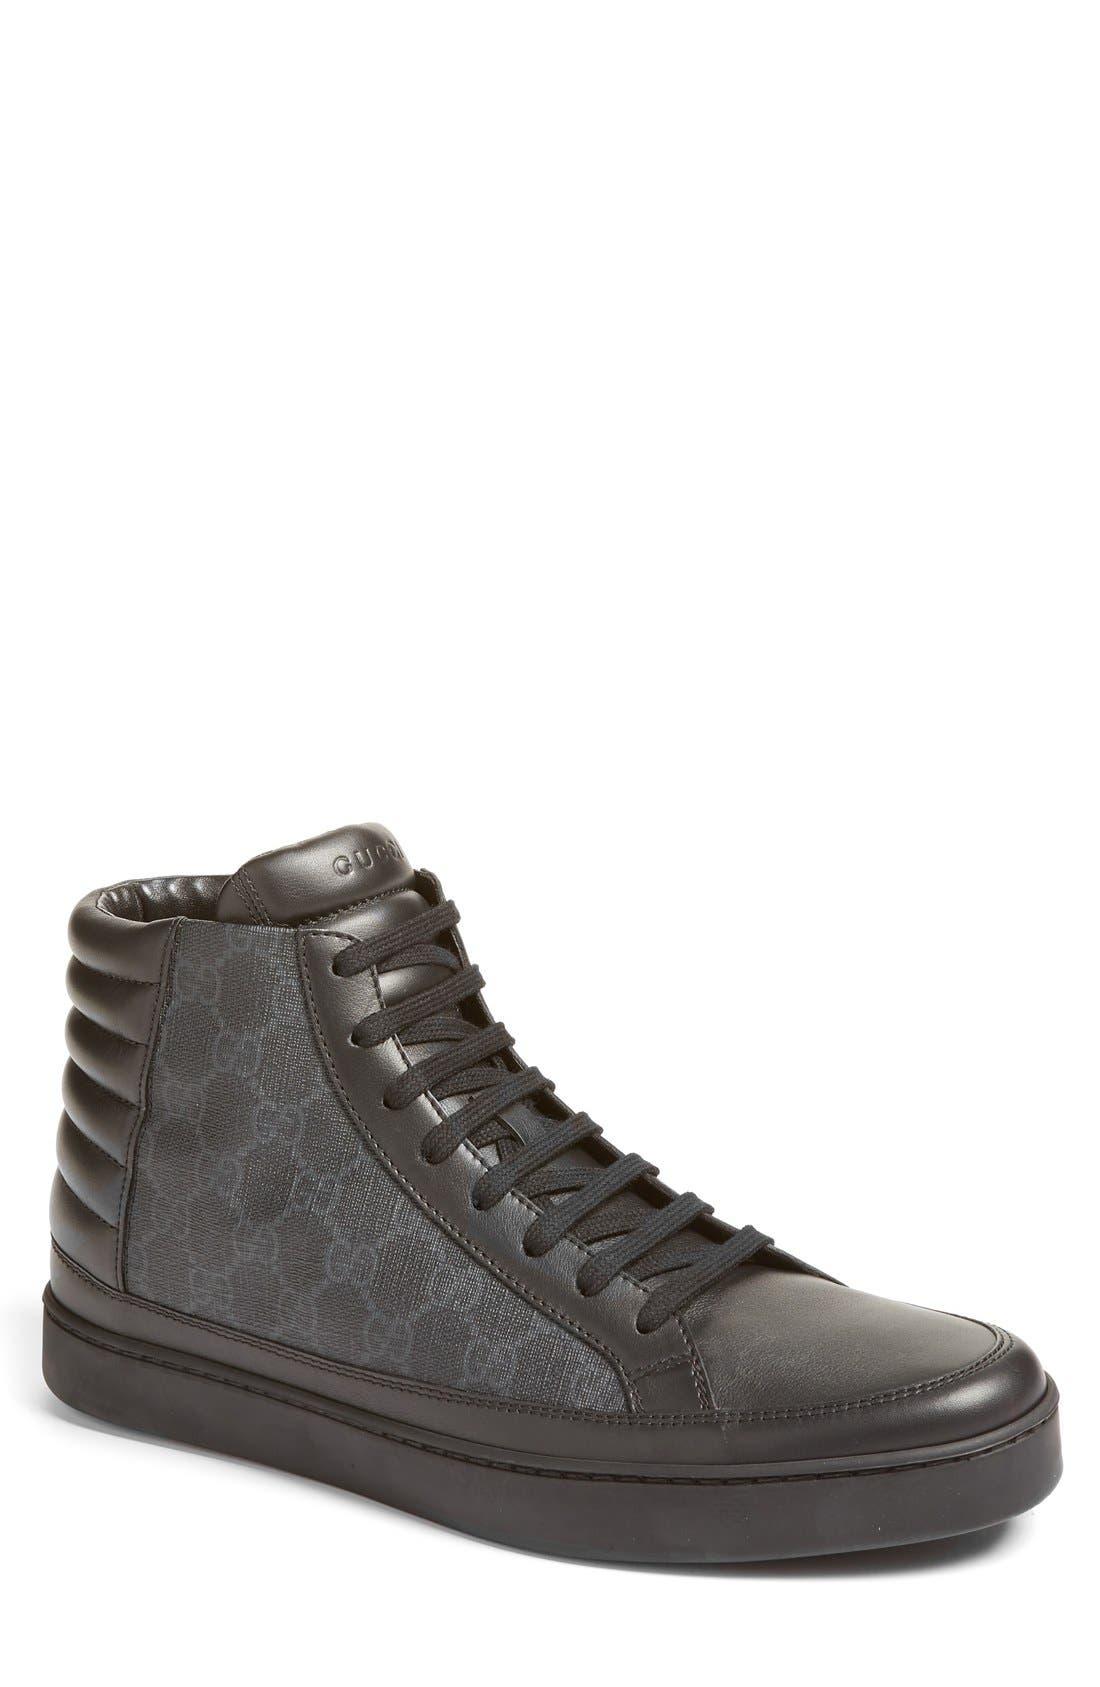 Alternate Image 1 Selected - Gucci 'Common' High Top Sneaker (Men)